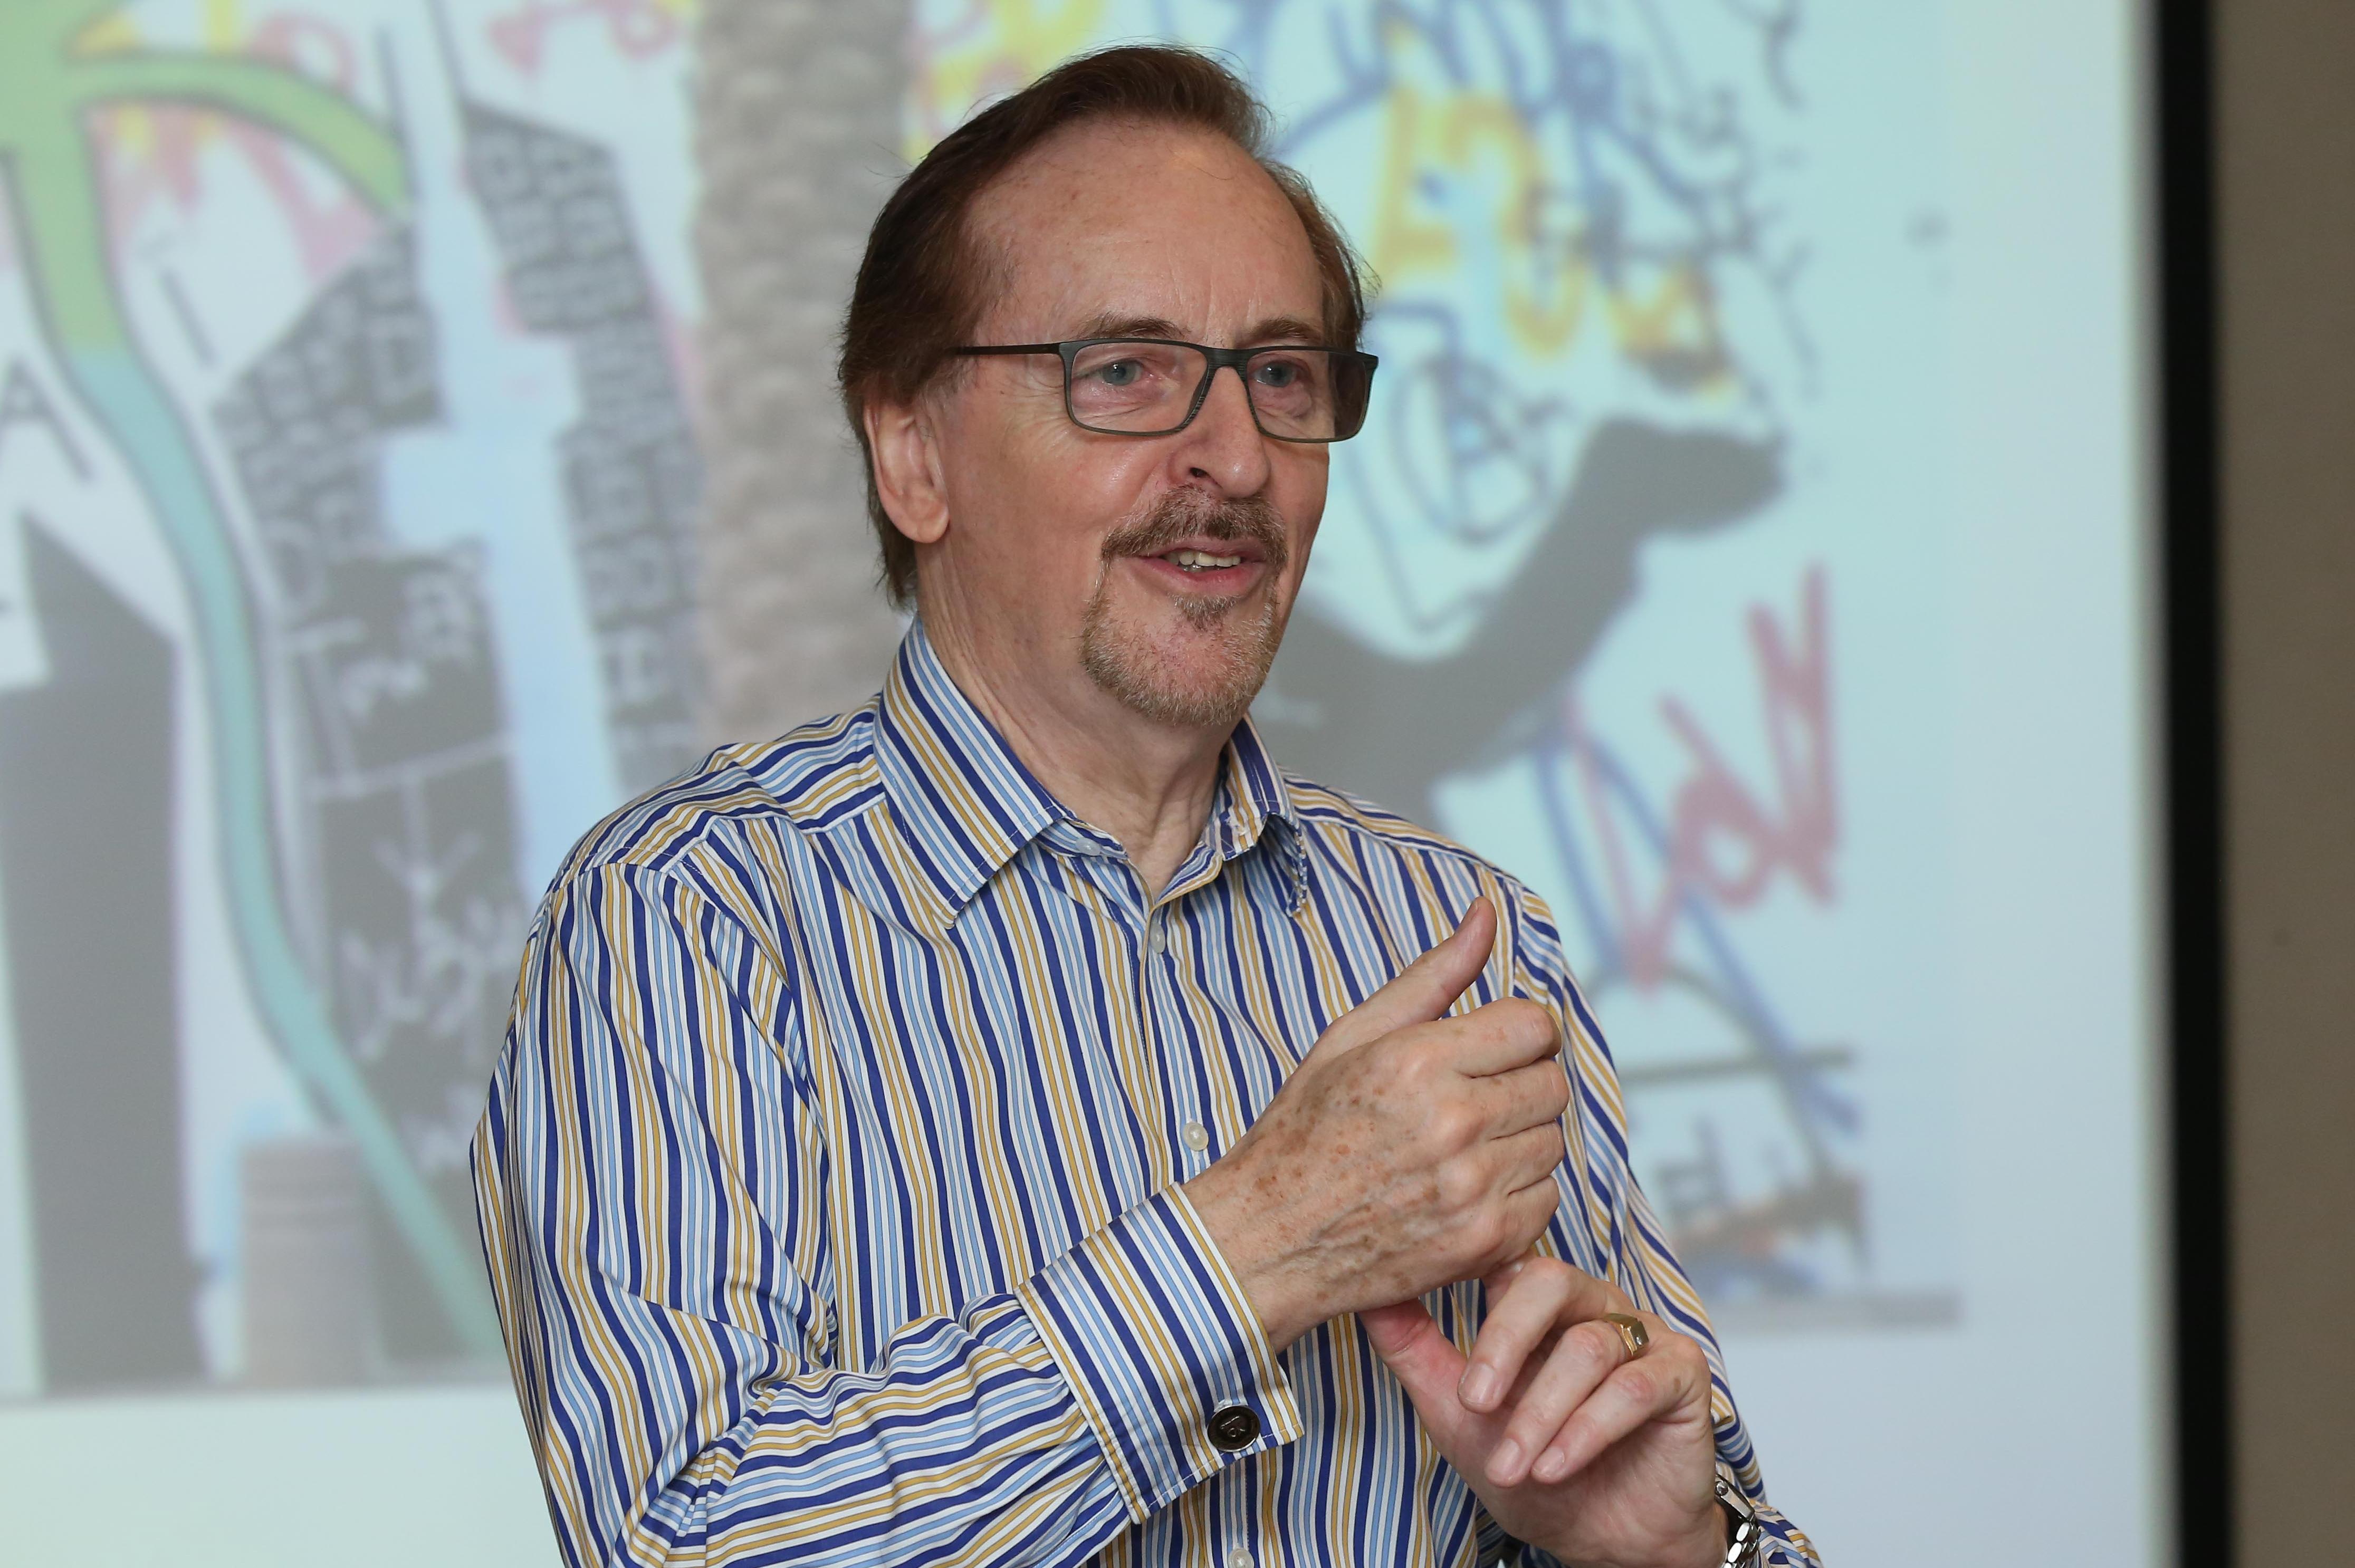 Professor Roy Batchelor of Cass